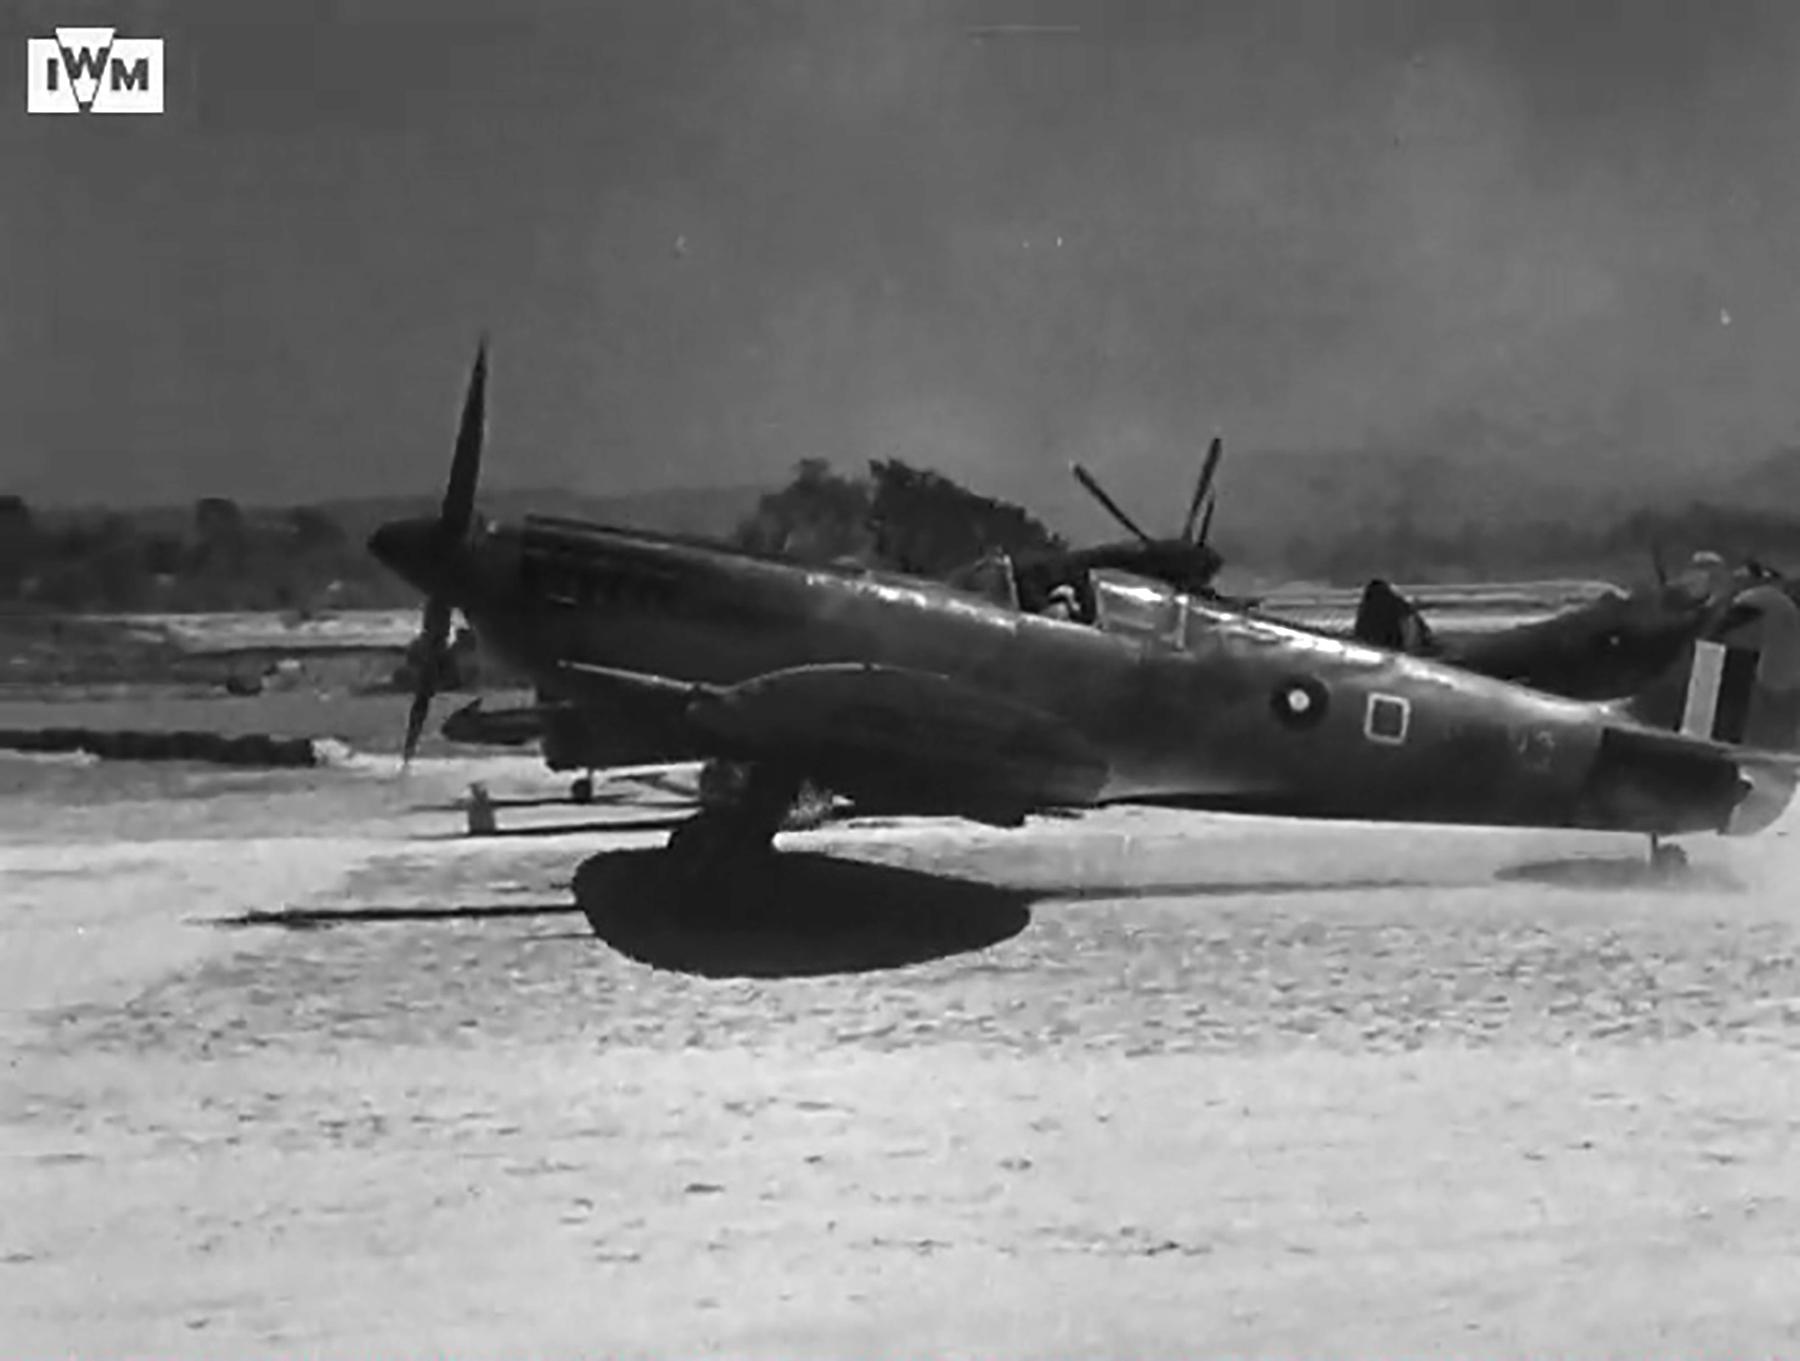 Spitfire VIII RAF 136Sqn HMO taking off from Rumkhapalong operating over Burma CBI 1944 IWM 02